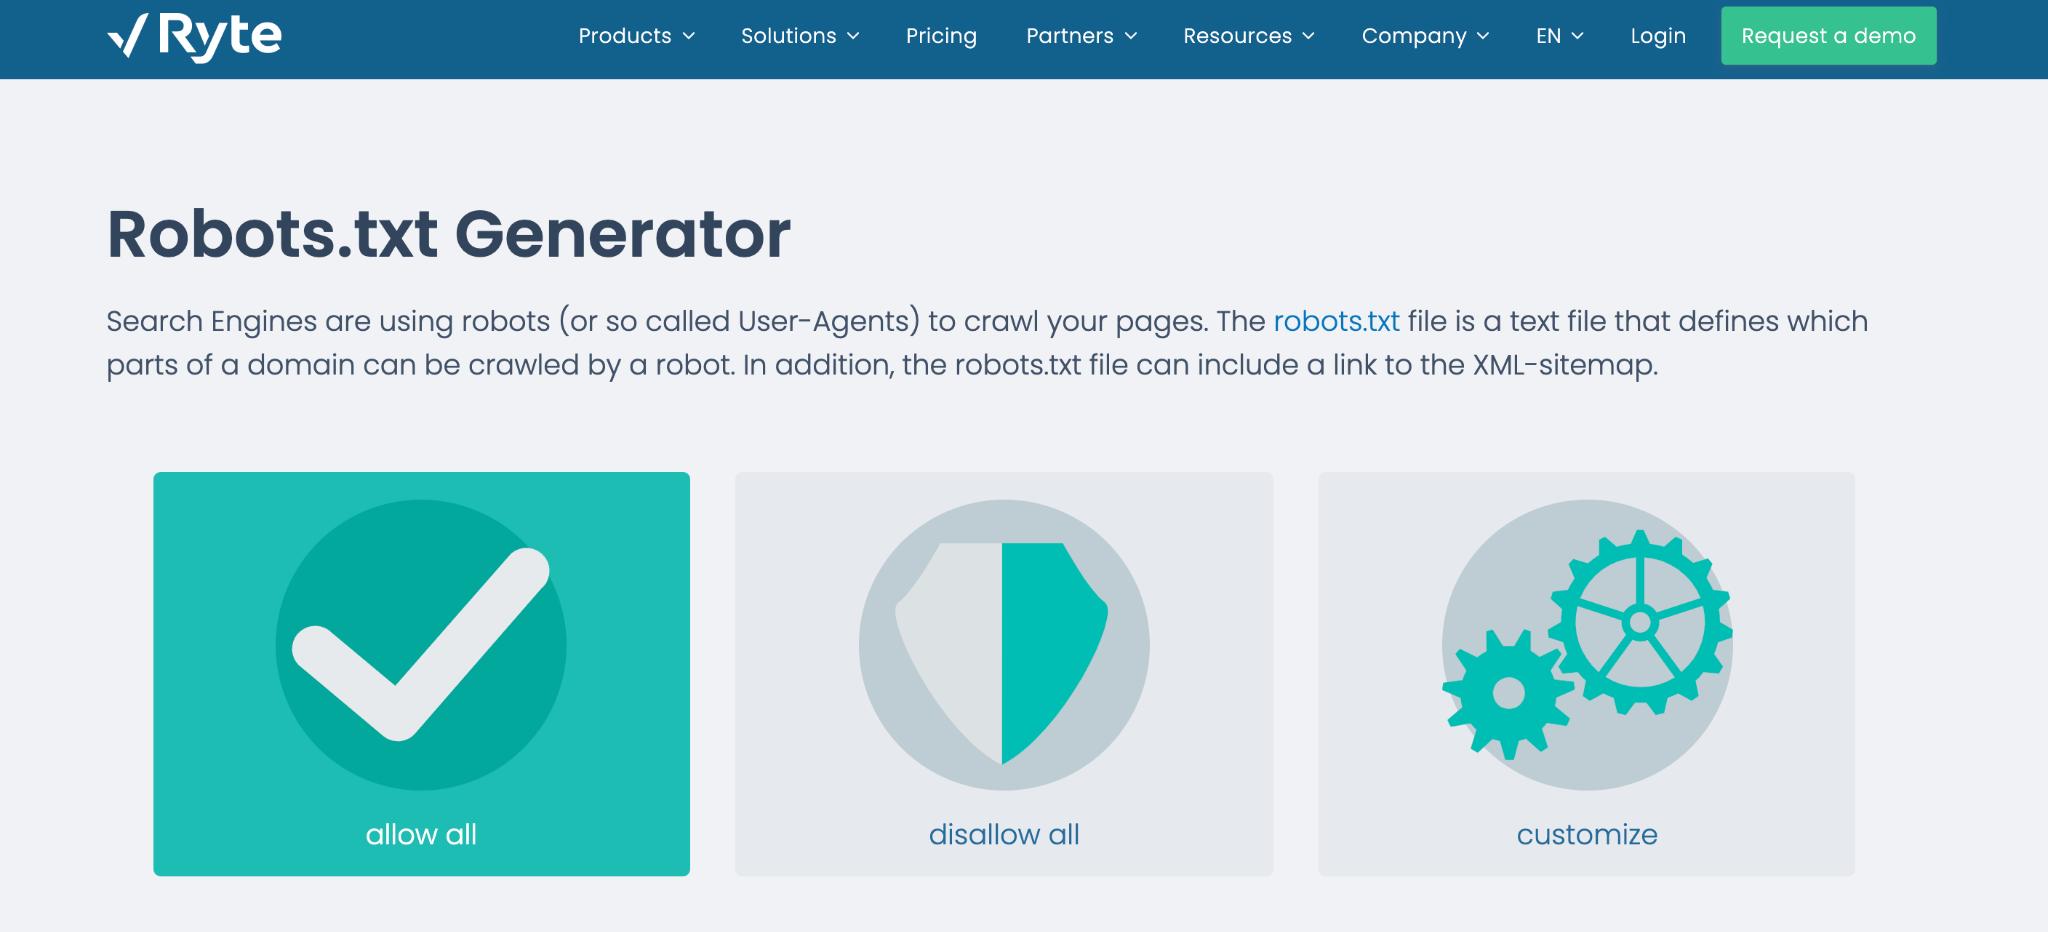 Ryte (Robots.txt Generator)